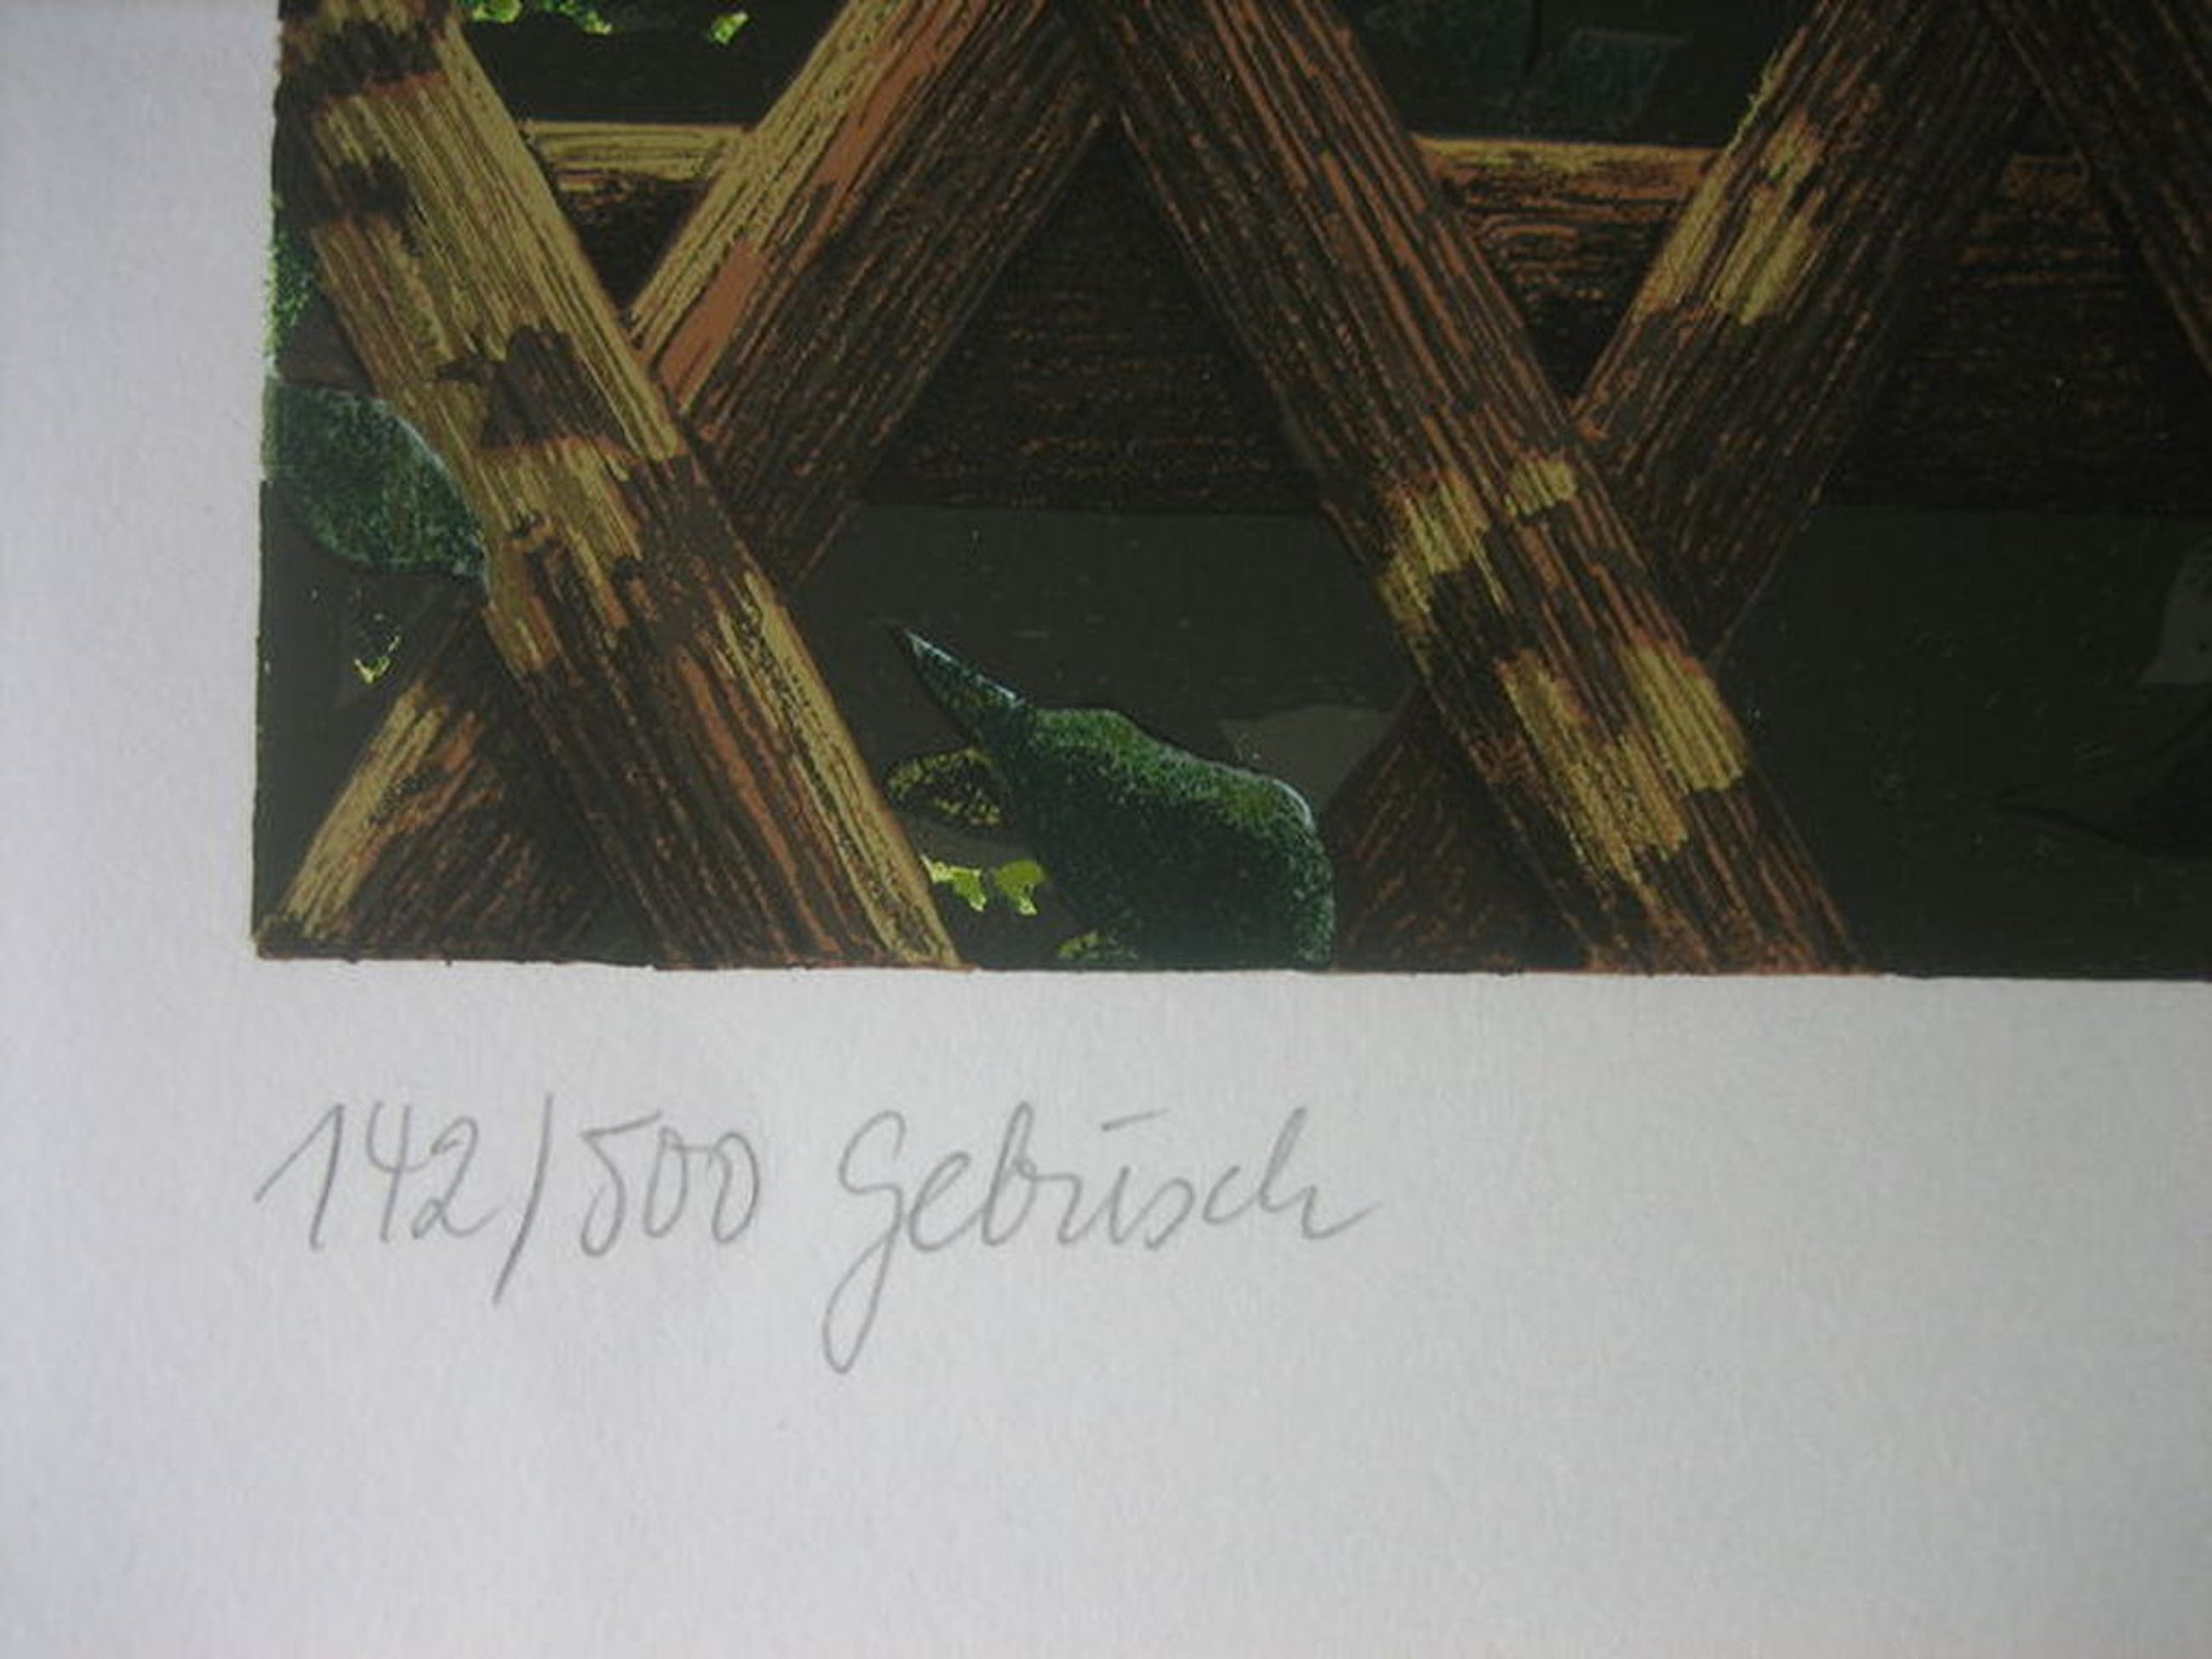 Rolf Schröder-Borm - Gebüsch - Lithografie - handgesigneerd - Oplage: 500 - 1974 kopen? Bied vanaf 1!